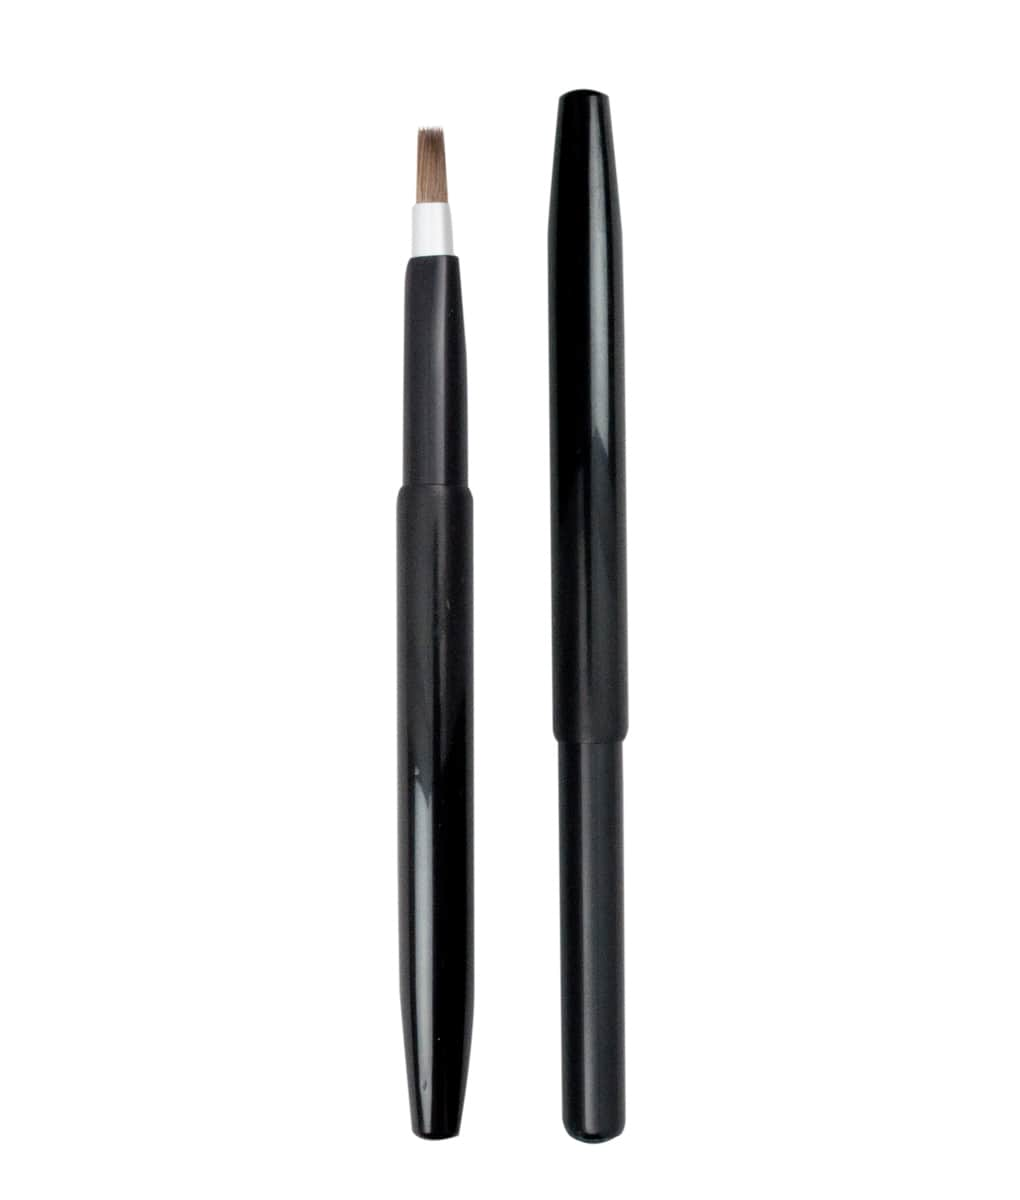 Retractable Lip Brush